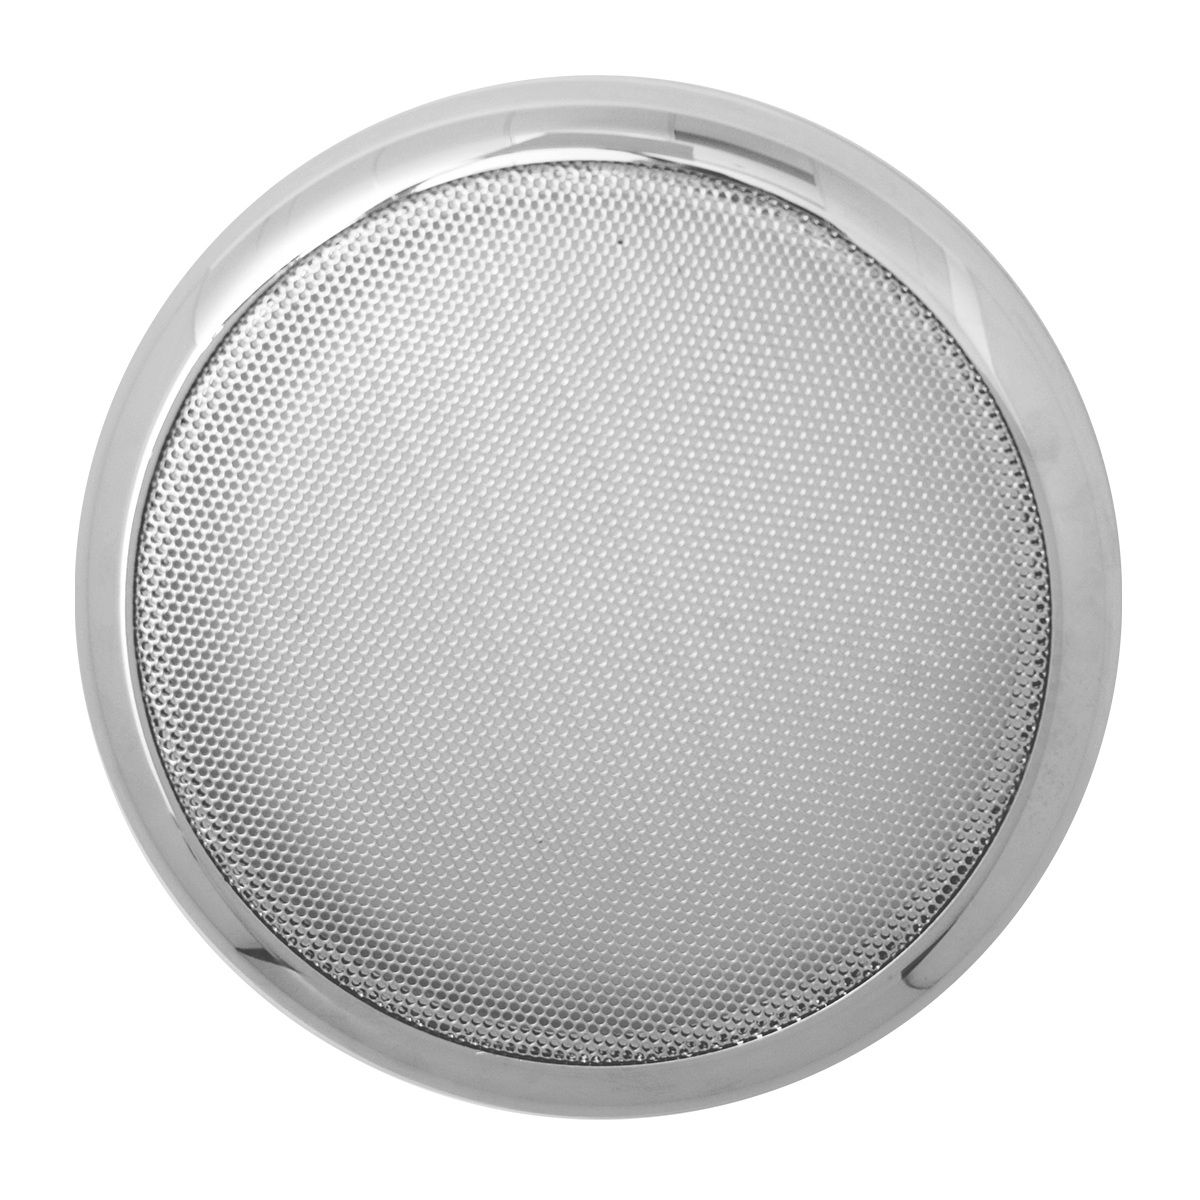 52027 Round Speaker Cover w/ Chrome Screen for Peterbilt